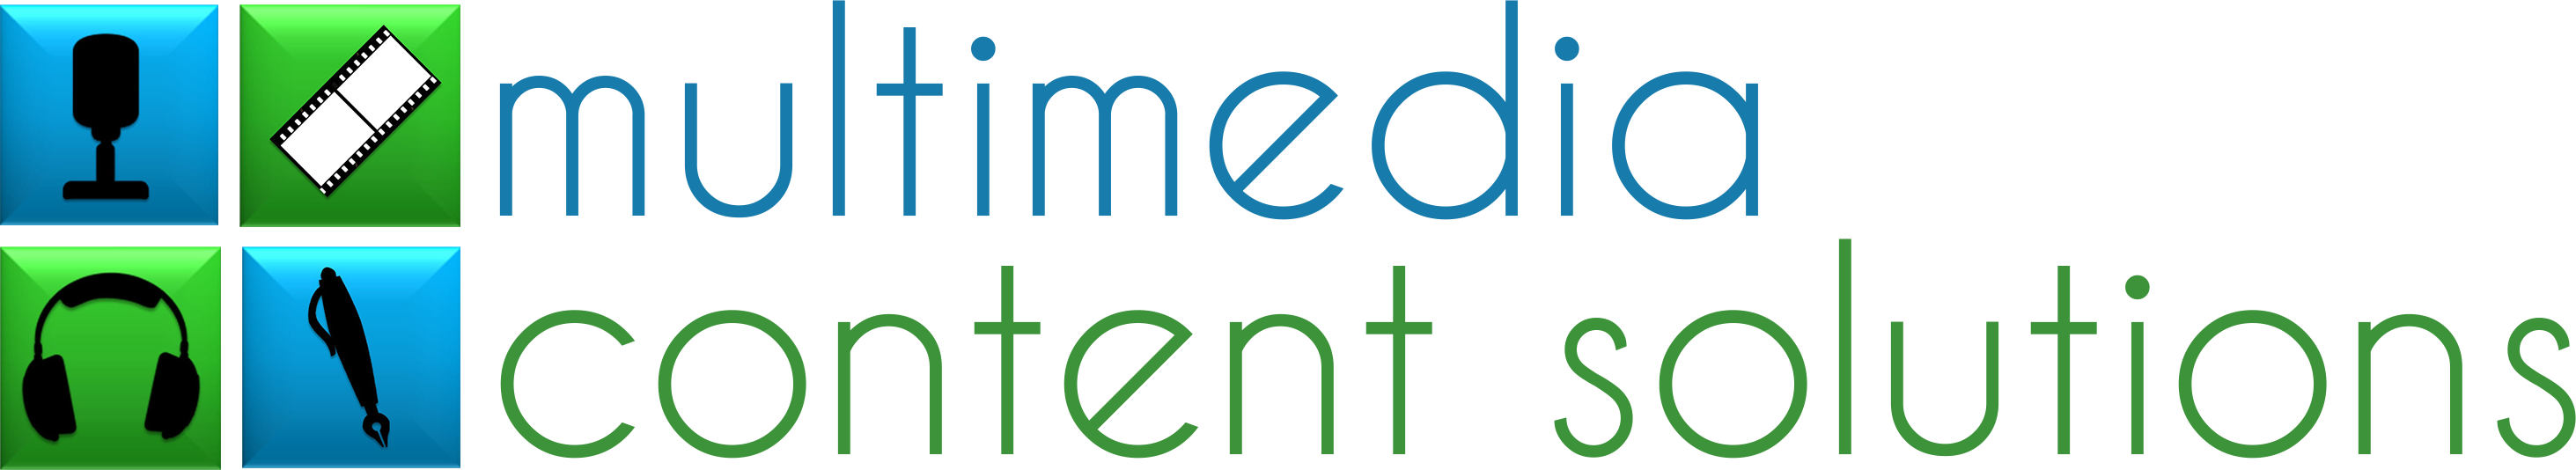 Multimedia Content Solutions